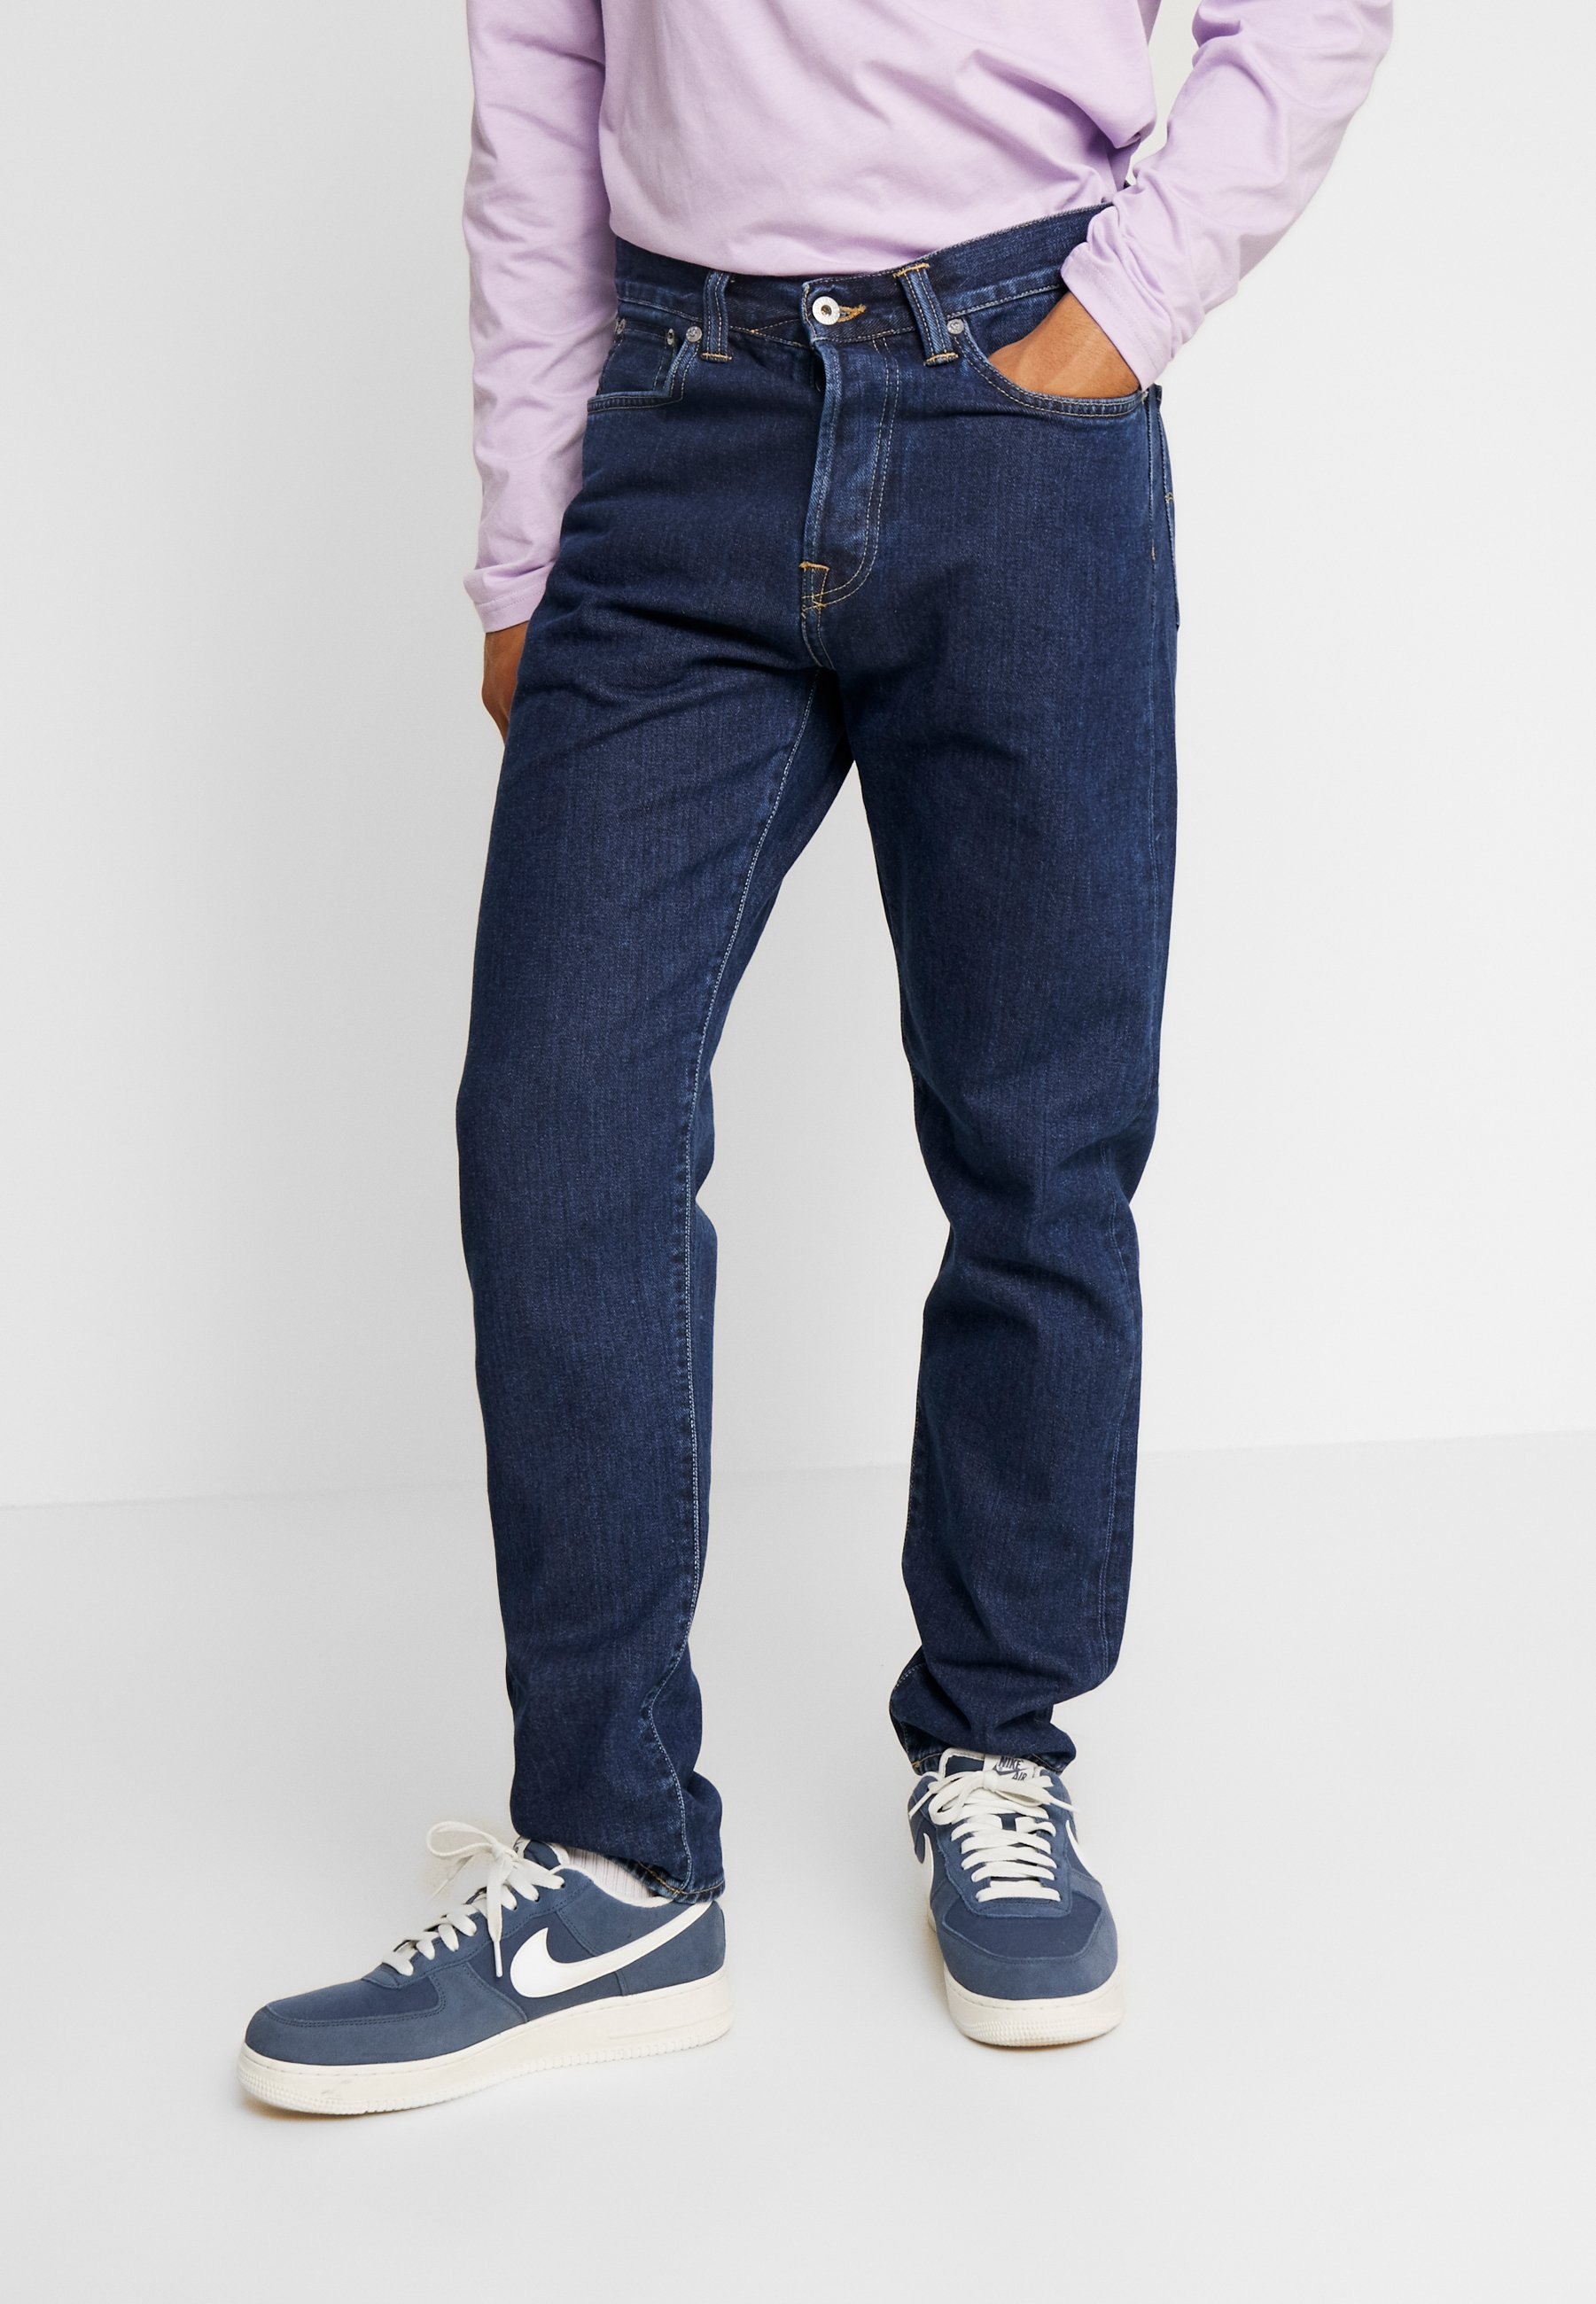 Ed Blue Denim Edwin Baggy 45 Loose Dark TaperedJeans 76fbgvYy